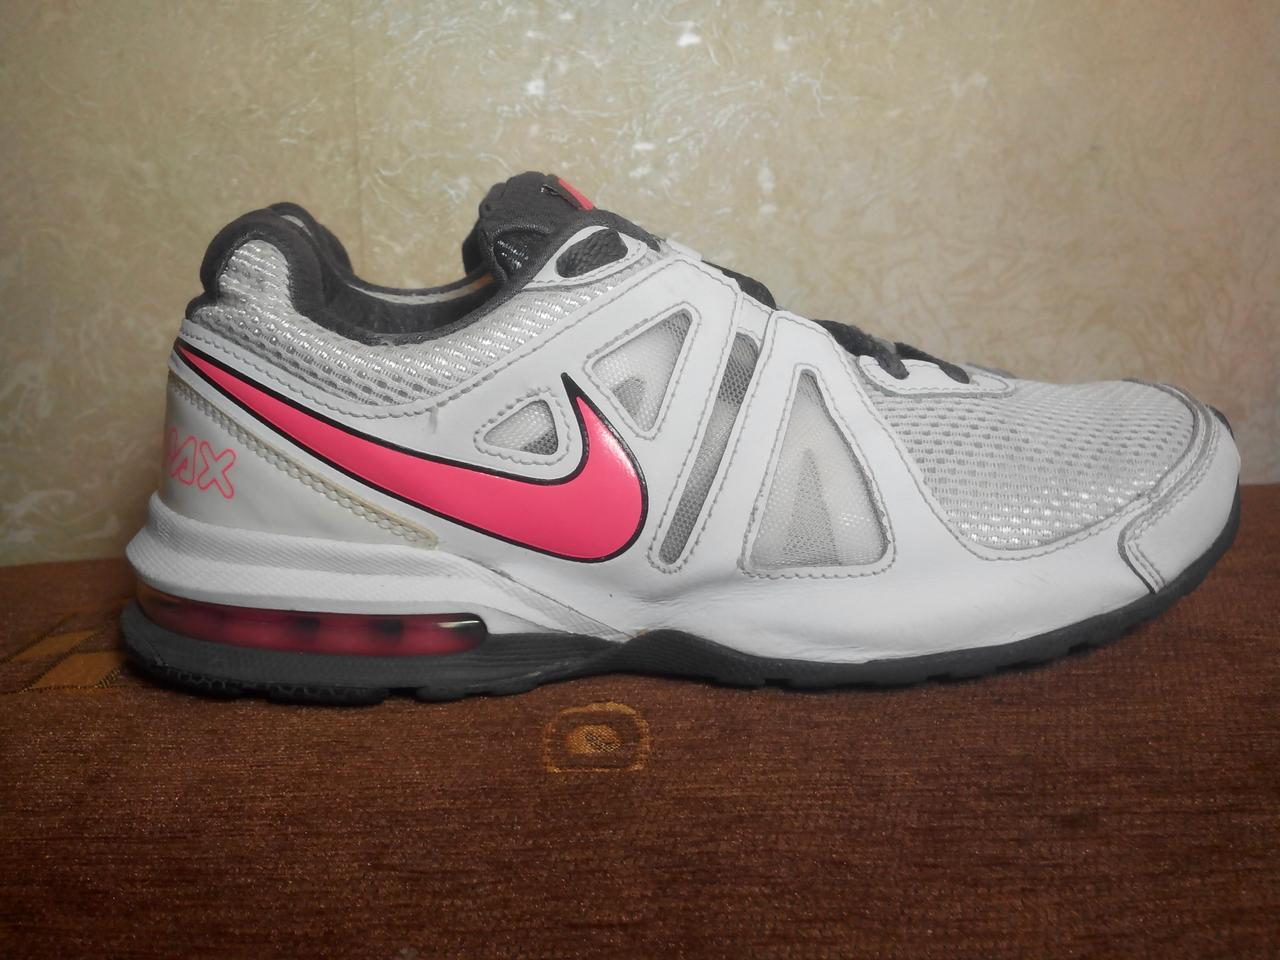 282326de Nike Air Max Limitless кроссовки. Оригинал! 38 р. -